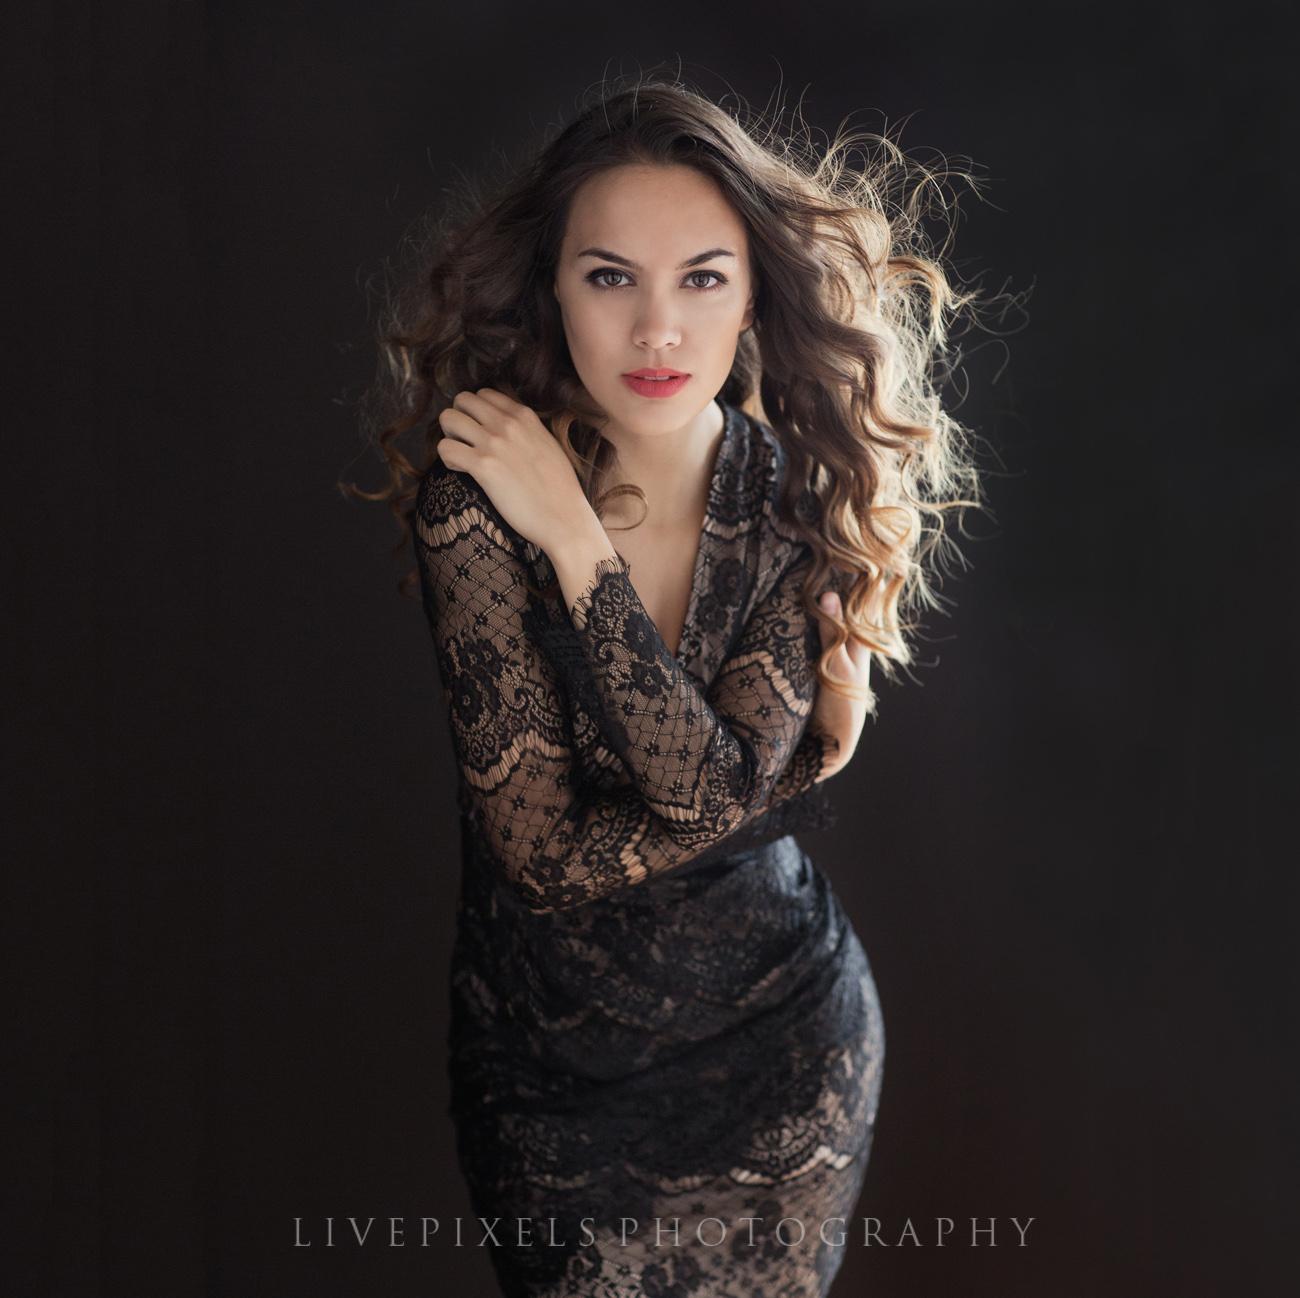 Toronto Beauty Portrait Studio - Livepixels Photography, Toronto / livepixelsphotography.com